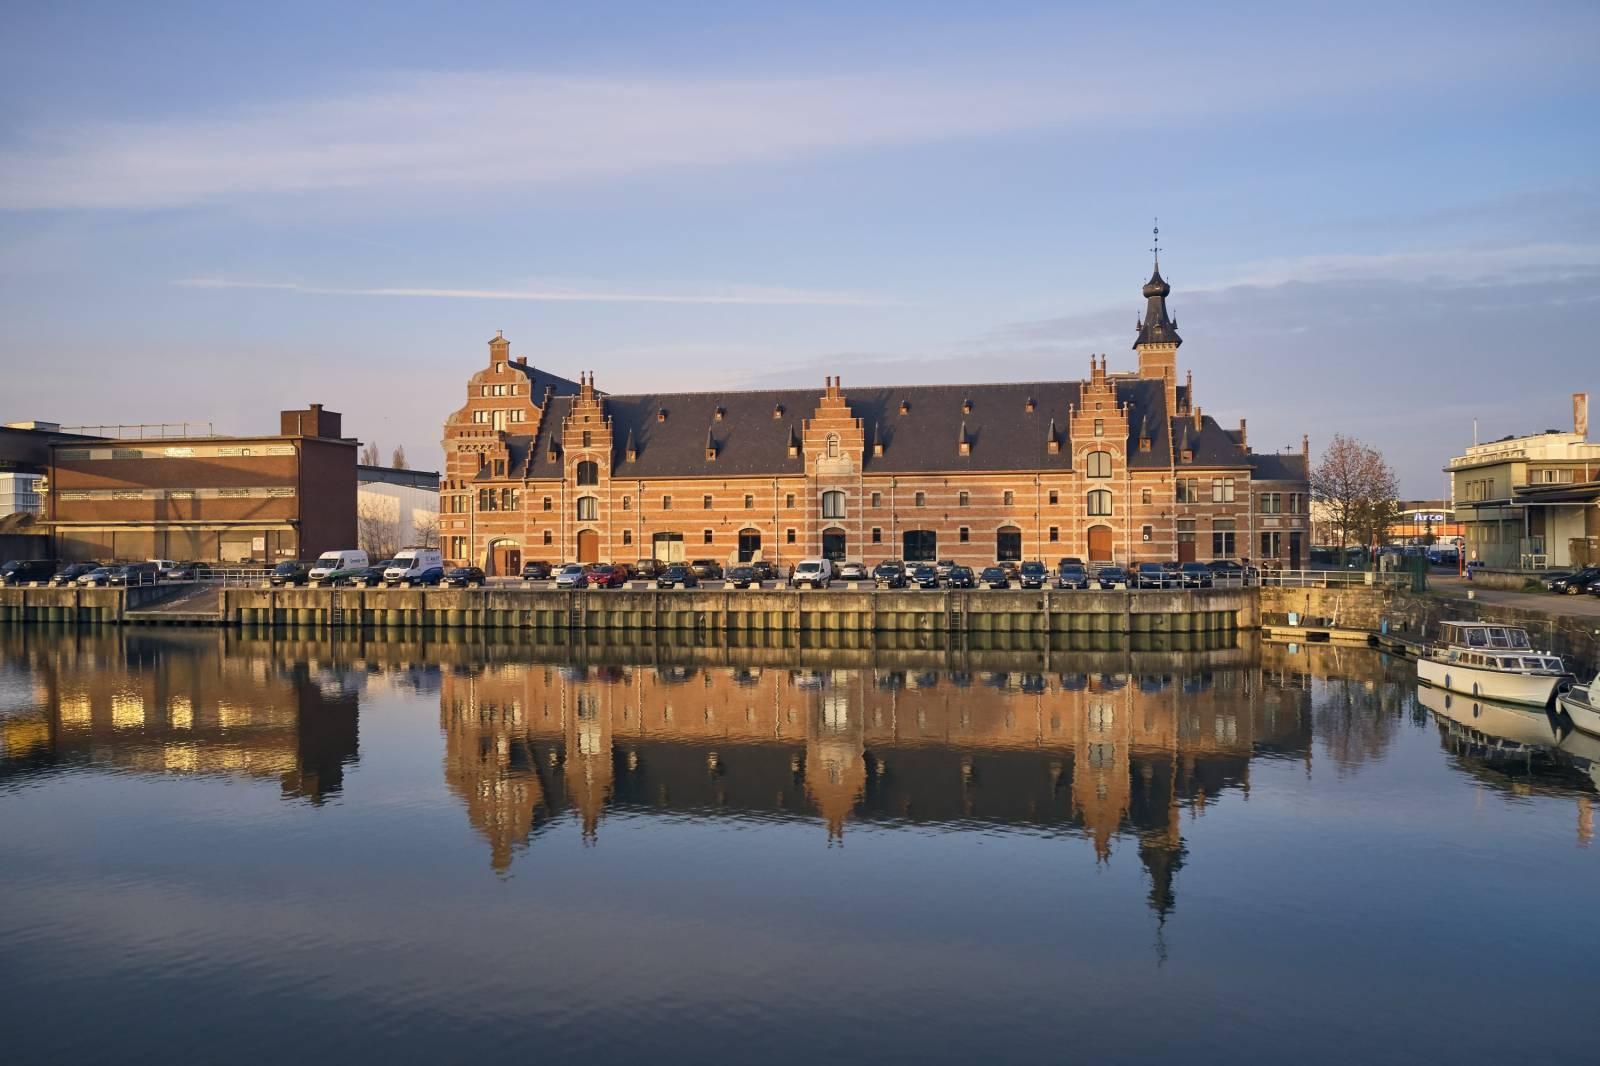 Feestal - Van der Valk hotel Mechelen - House of Weddings (11)